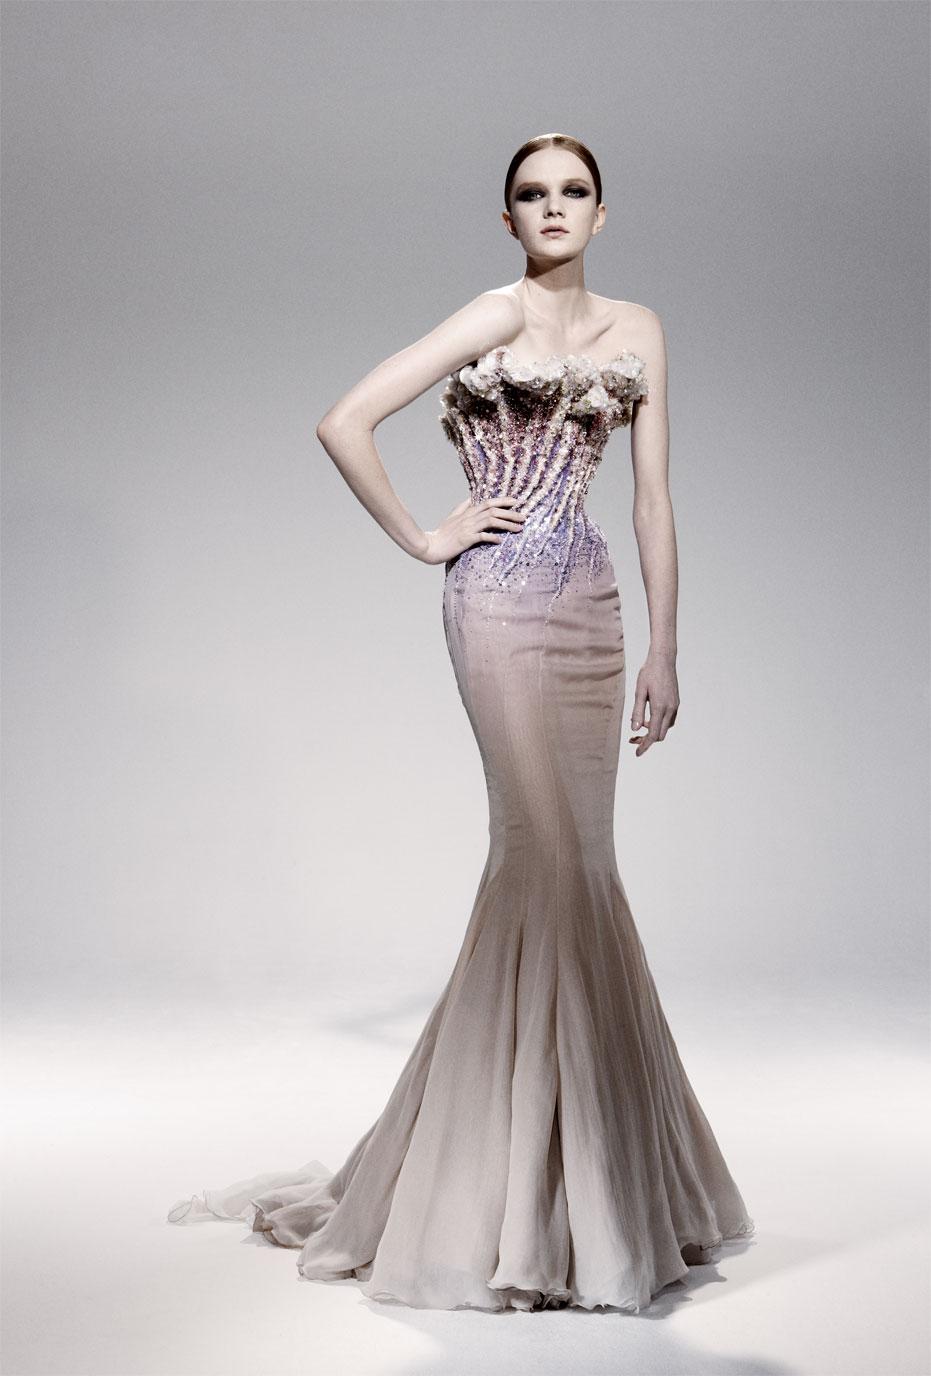 Iridescent coral dress